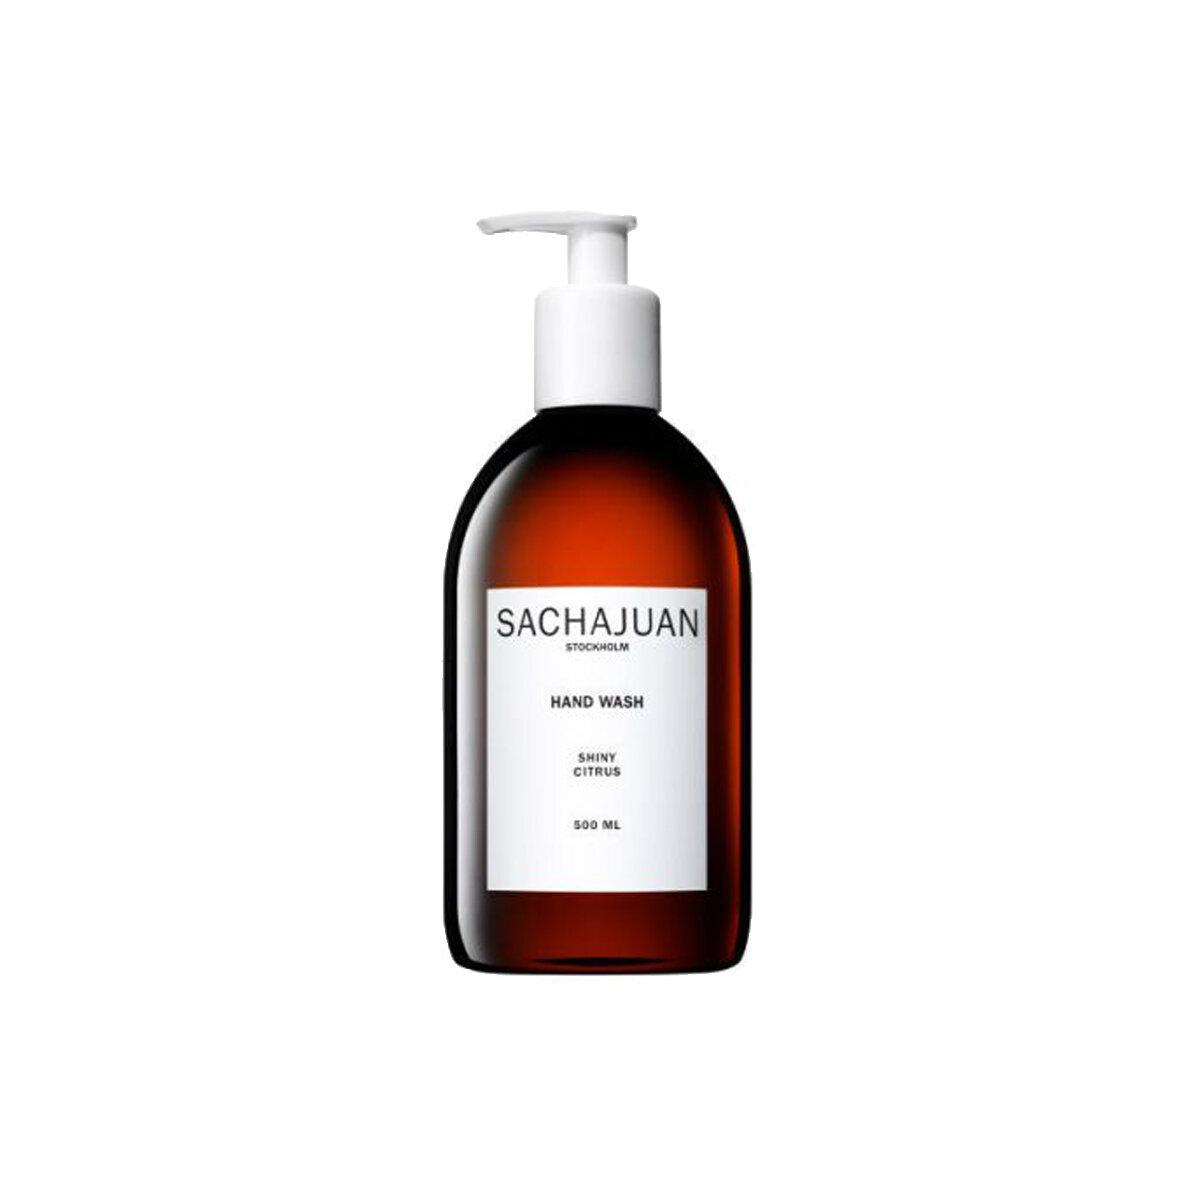 Sachajuan Hand Wash - Shiny Citrus (500ml)